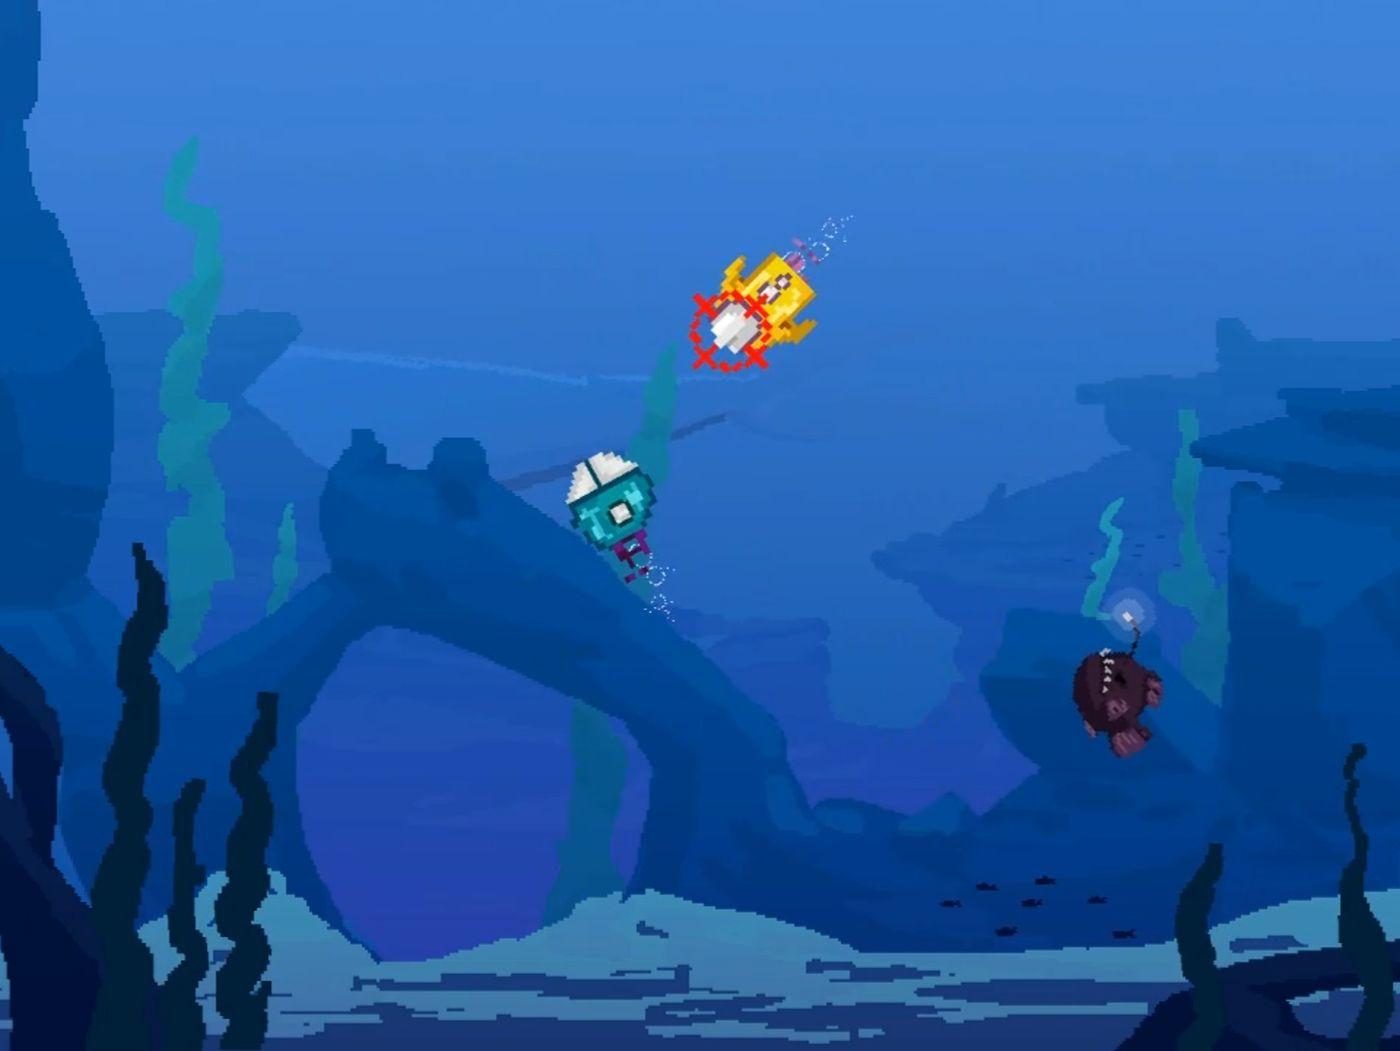 Subrawl - a retro game mashup